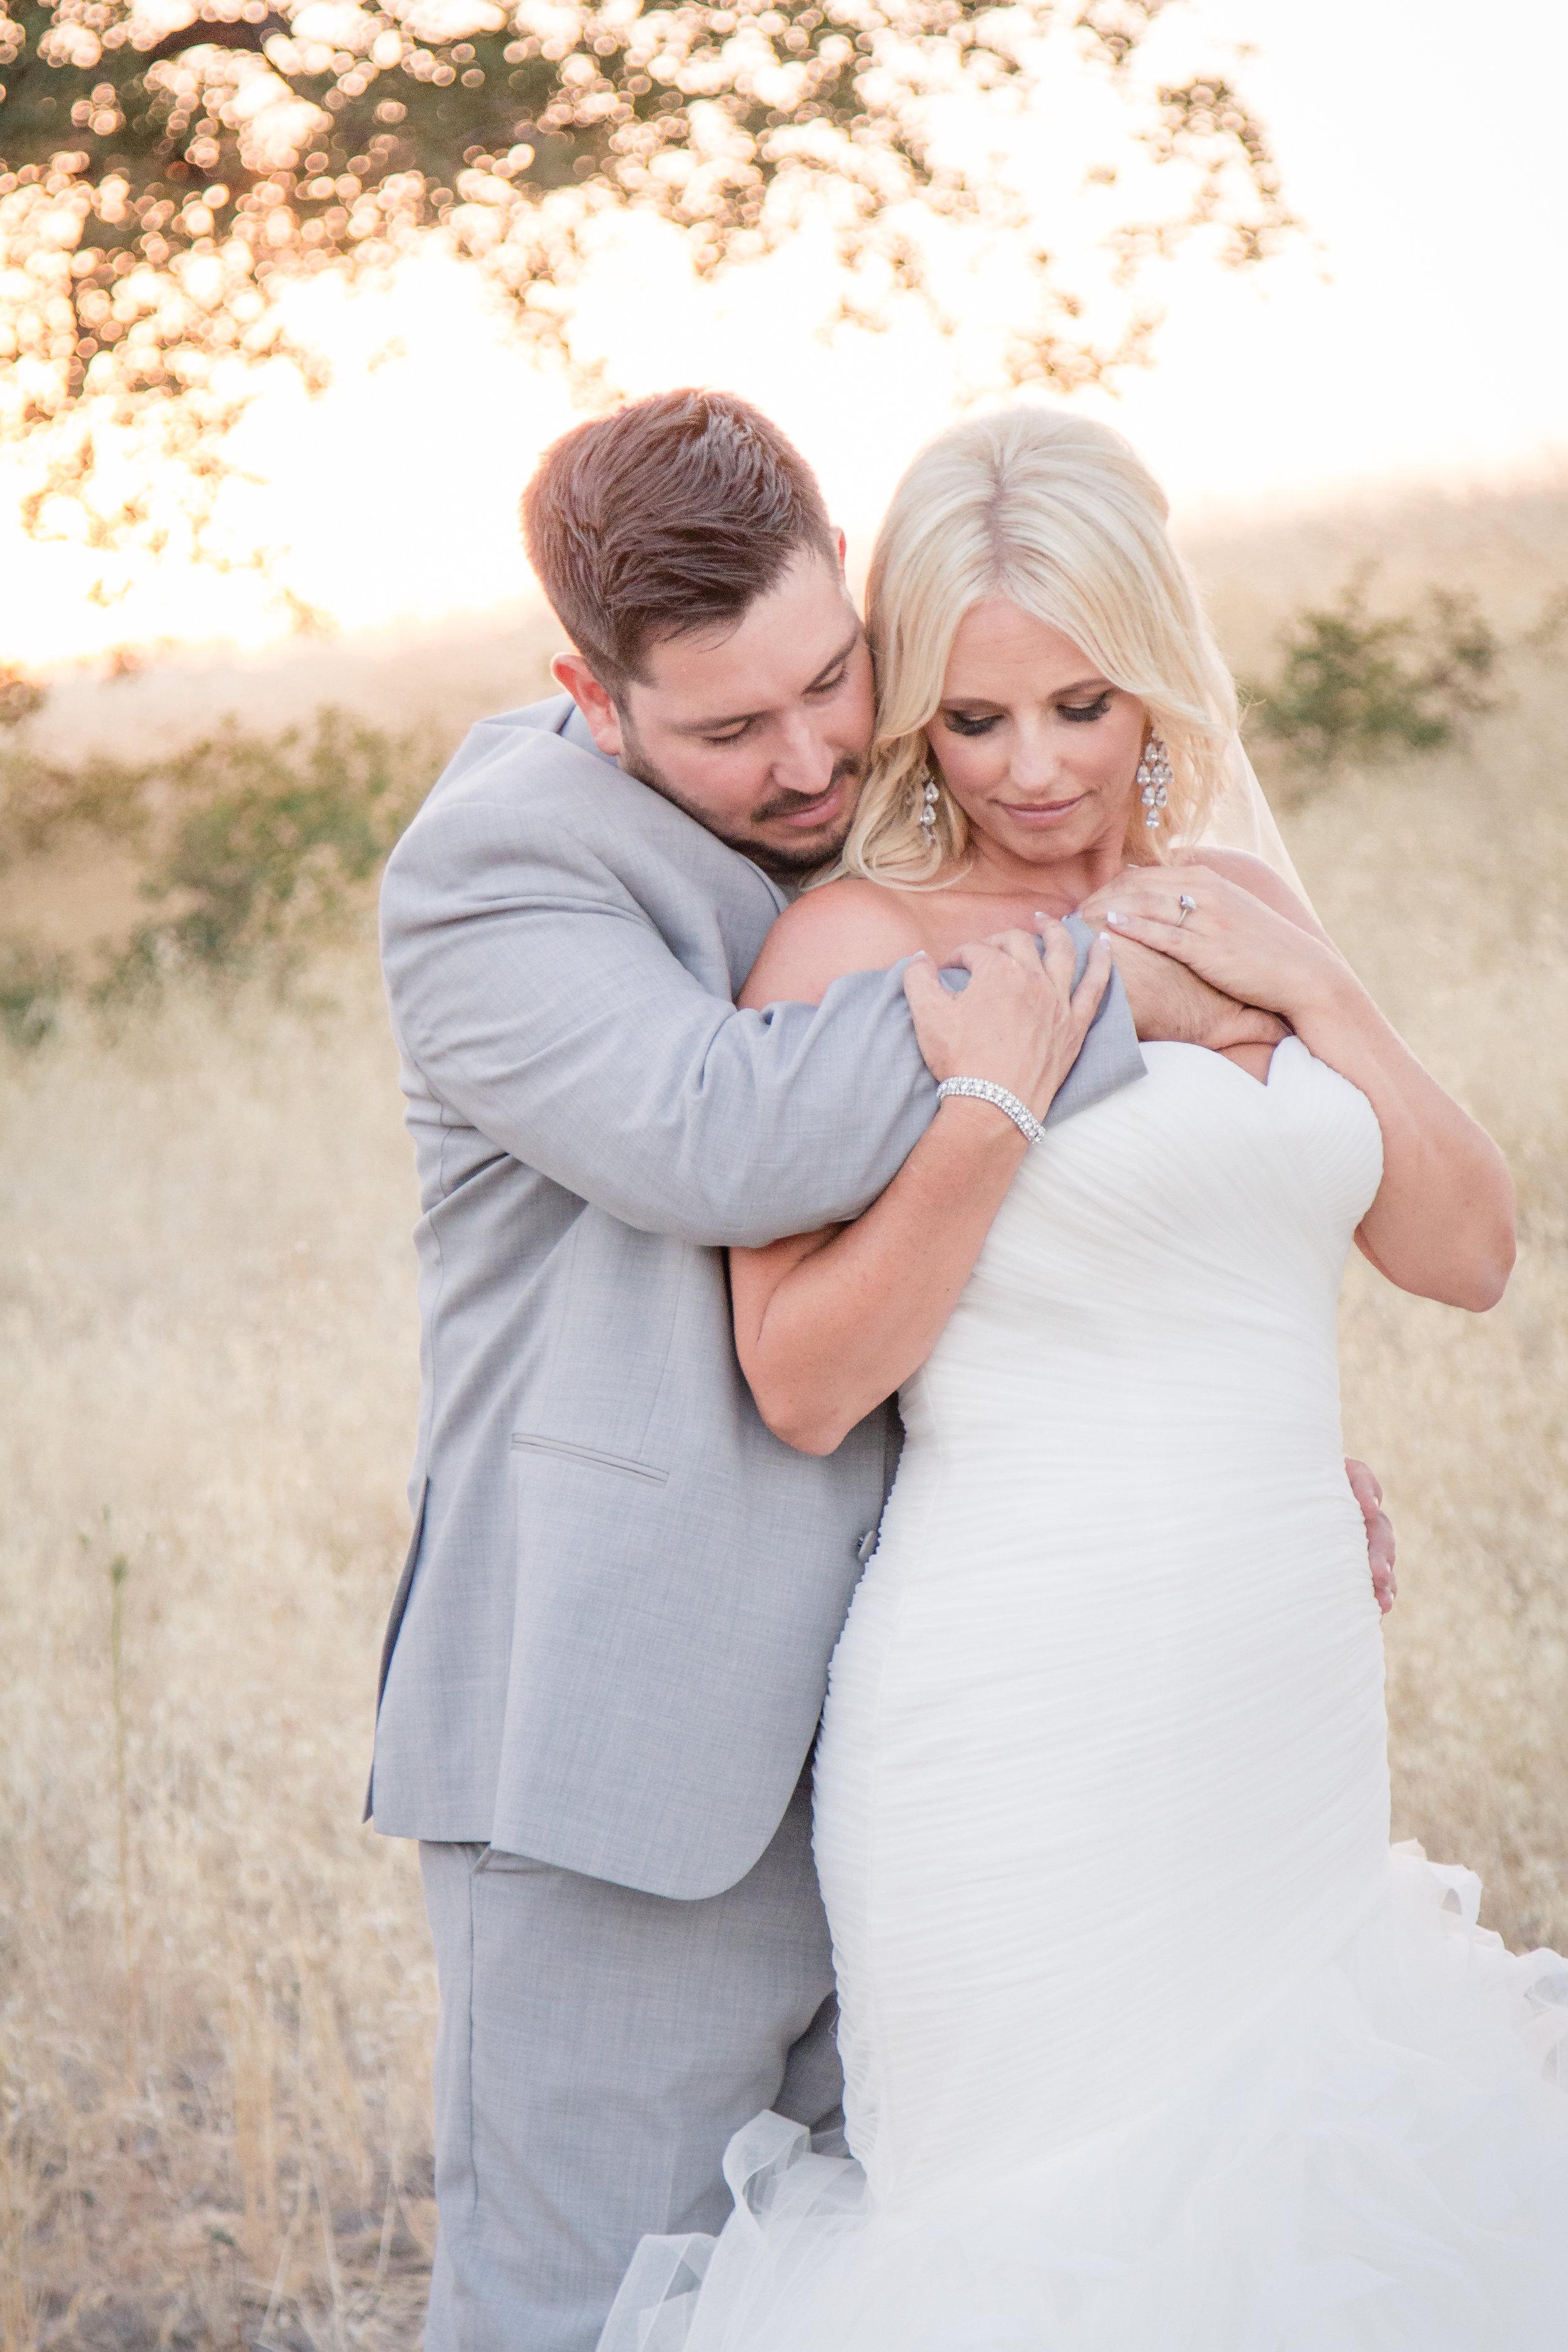 White Ranch Events - Chico - Ashley Teasley Photography - Sacramento Wedding Photographer 32.JPG